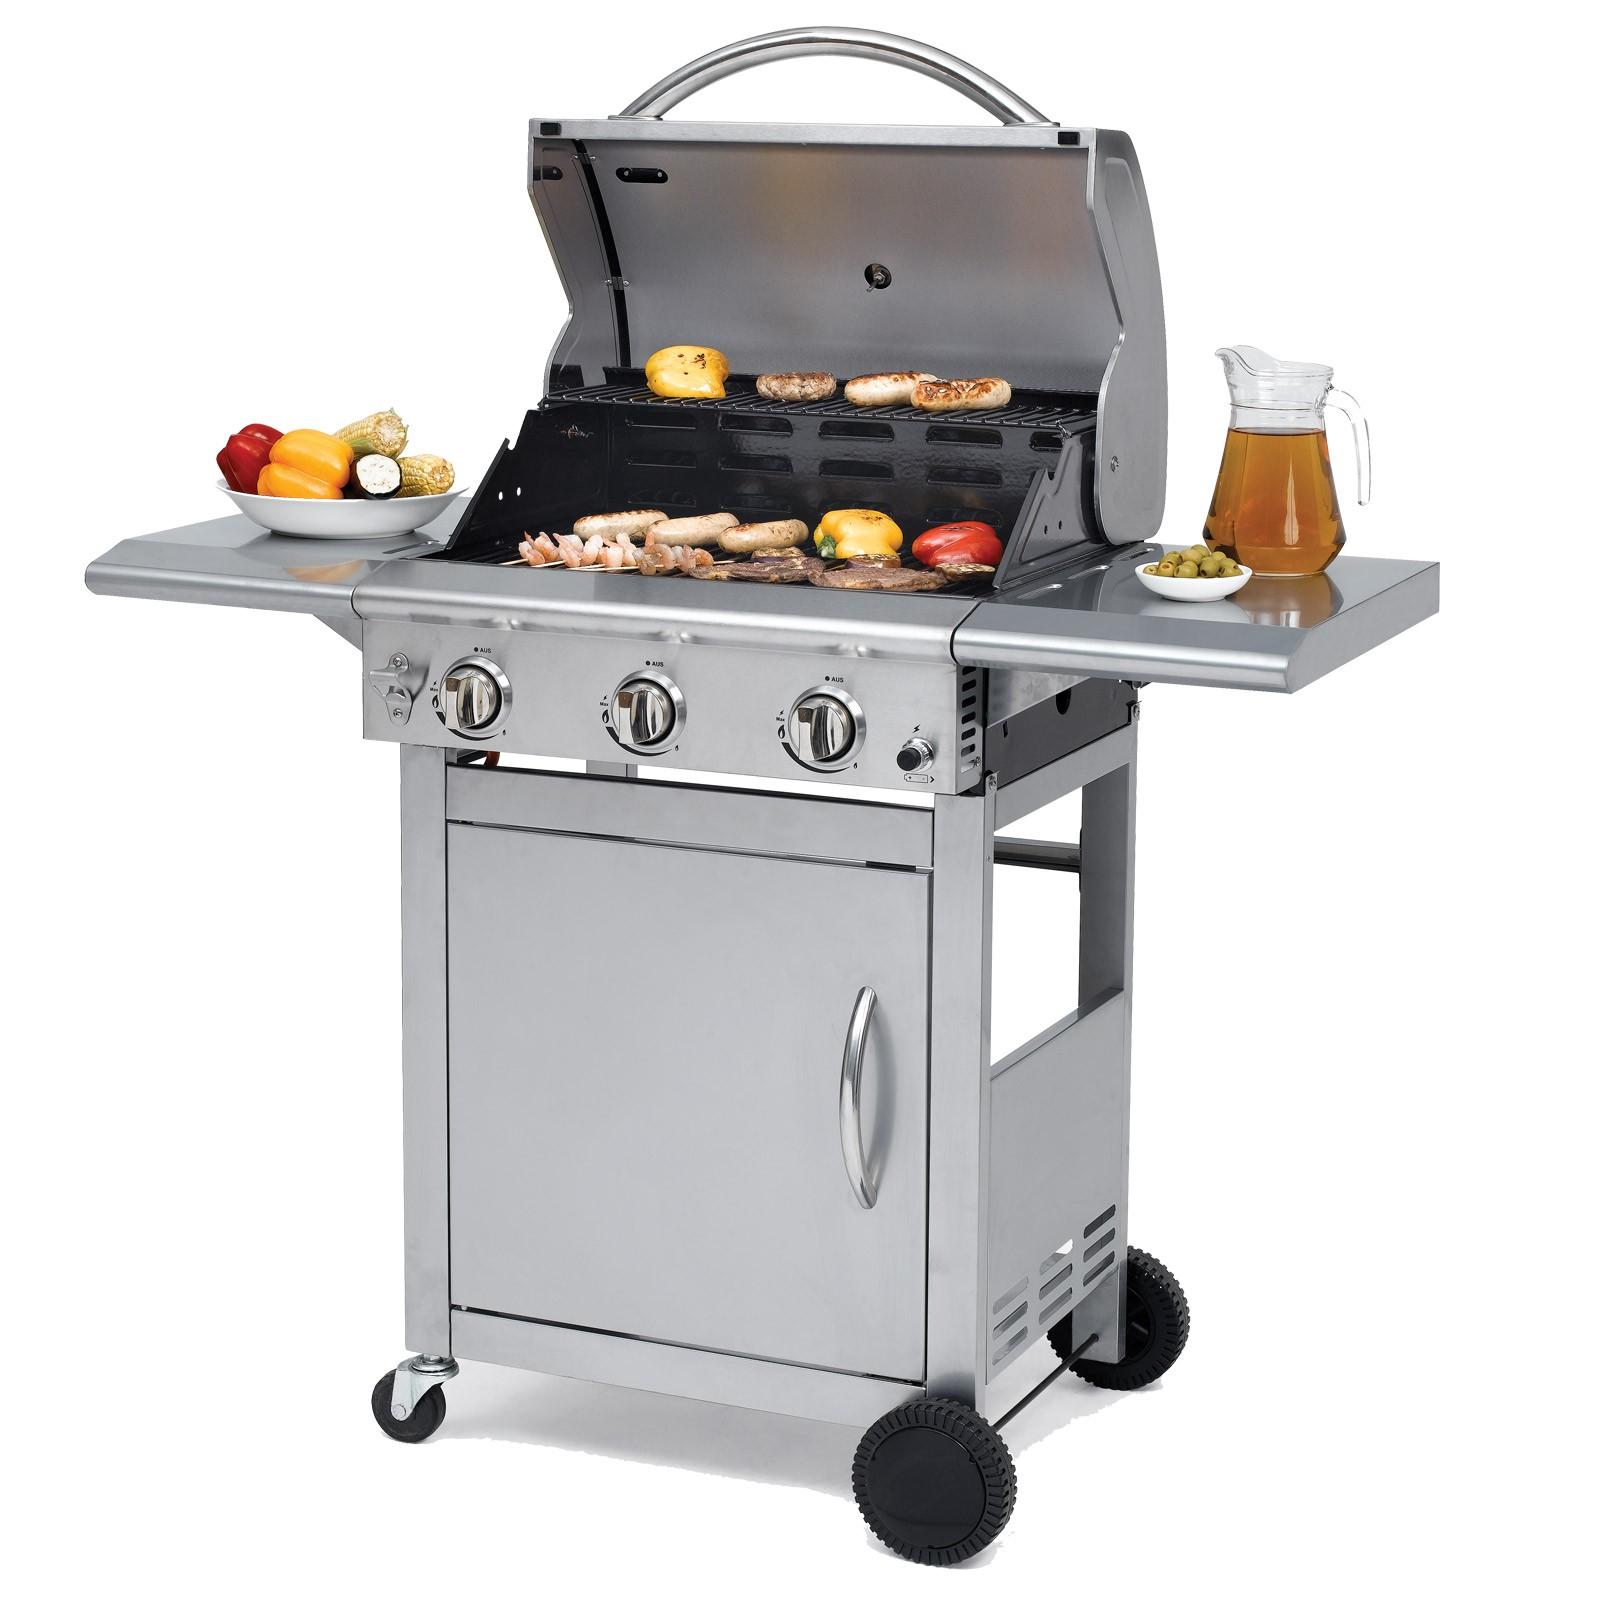 tepro edelstahl gasgrill 3 brenner grillwagen bbq grill calverton silber ebay. Black Bedroom Furniture Sets. Home Design Ideas